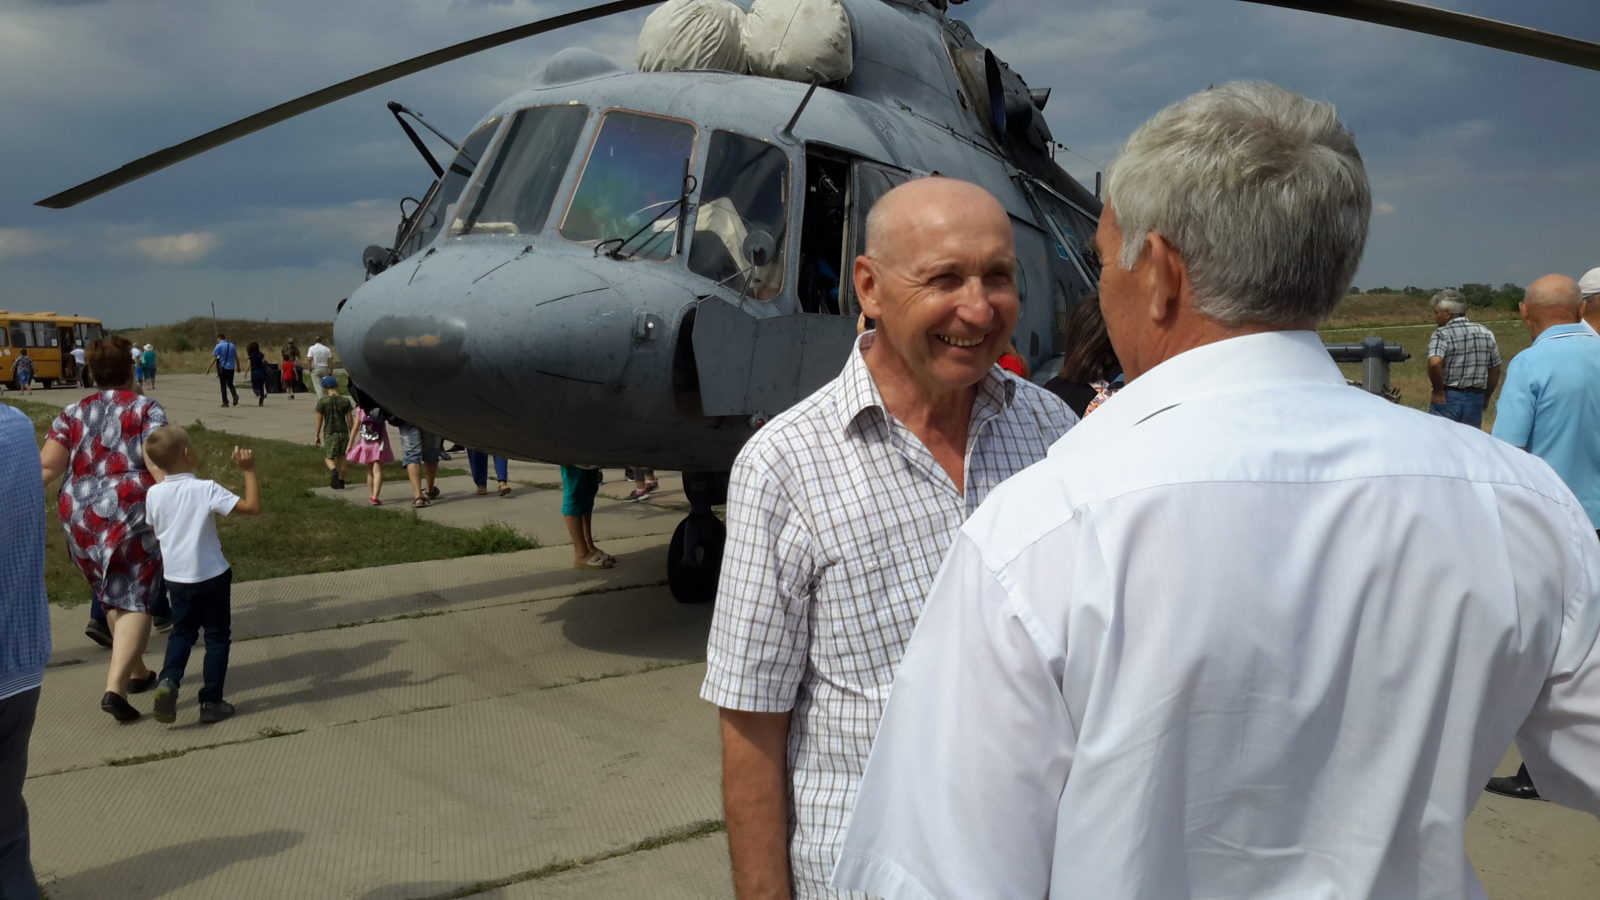 Однополчане беседуют на фоне вертолета